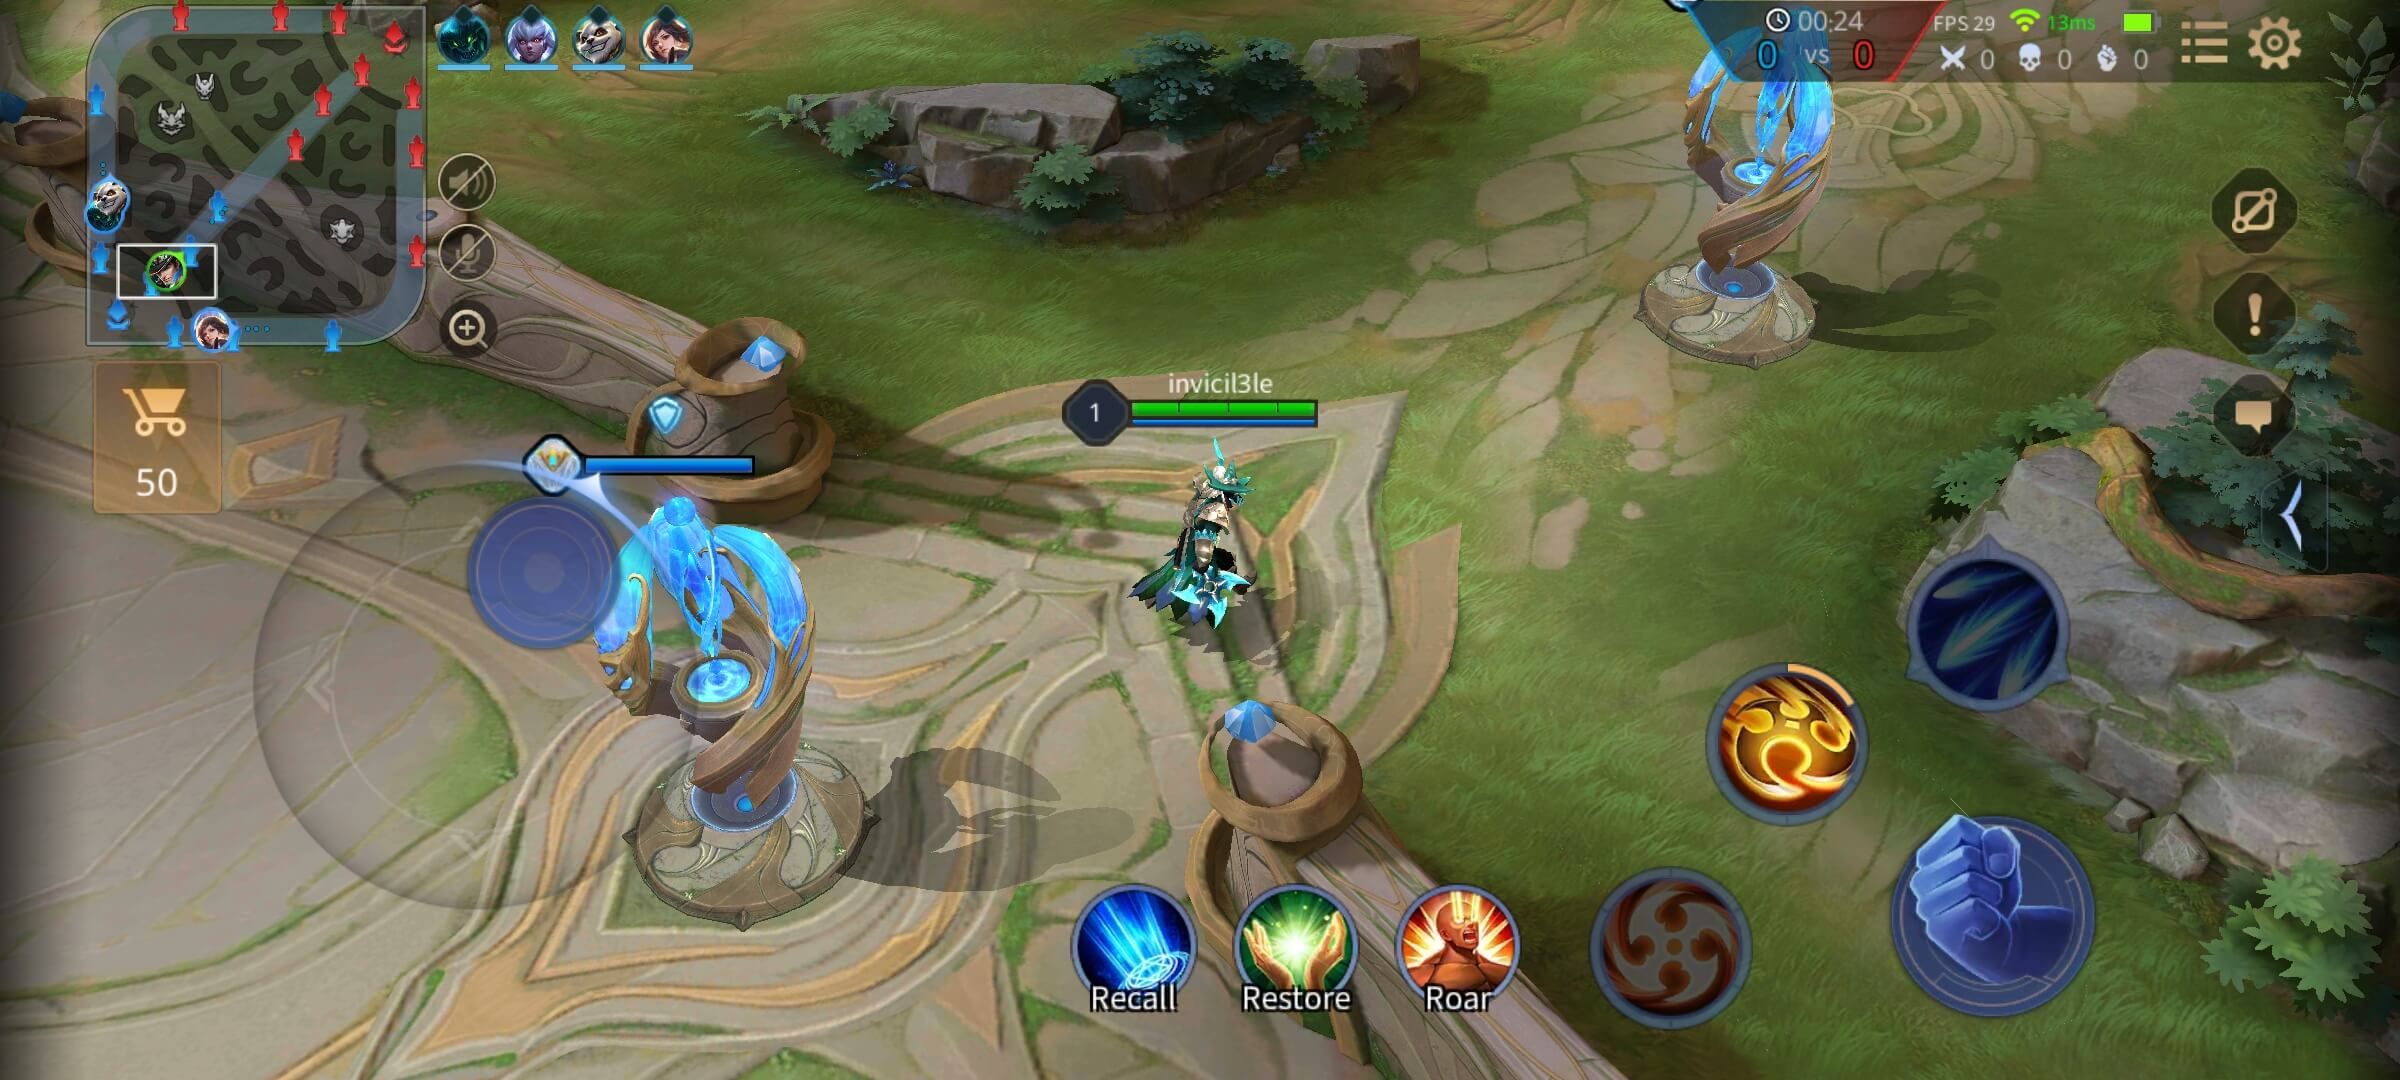 Screenshot 20200619 150017 com.garena.game .kgth